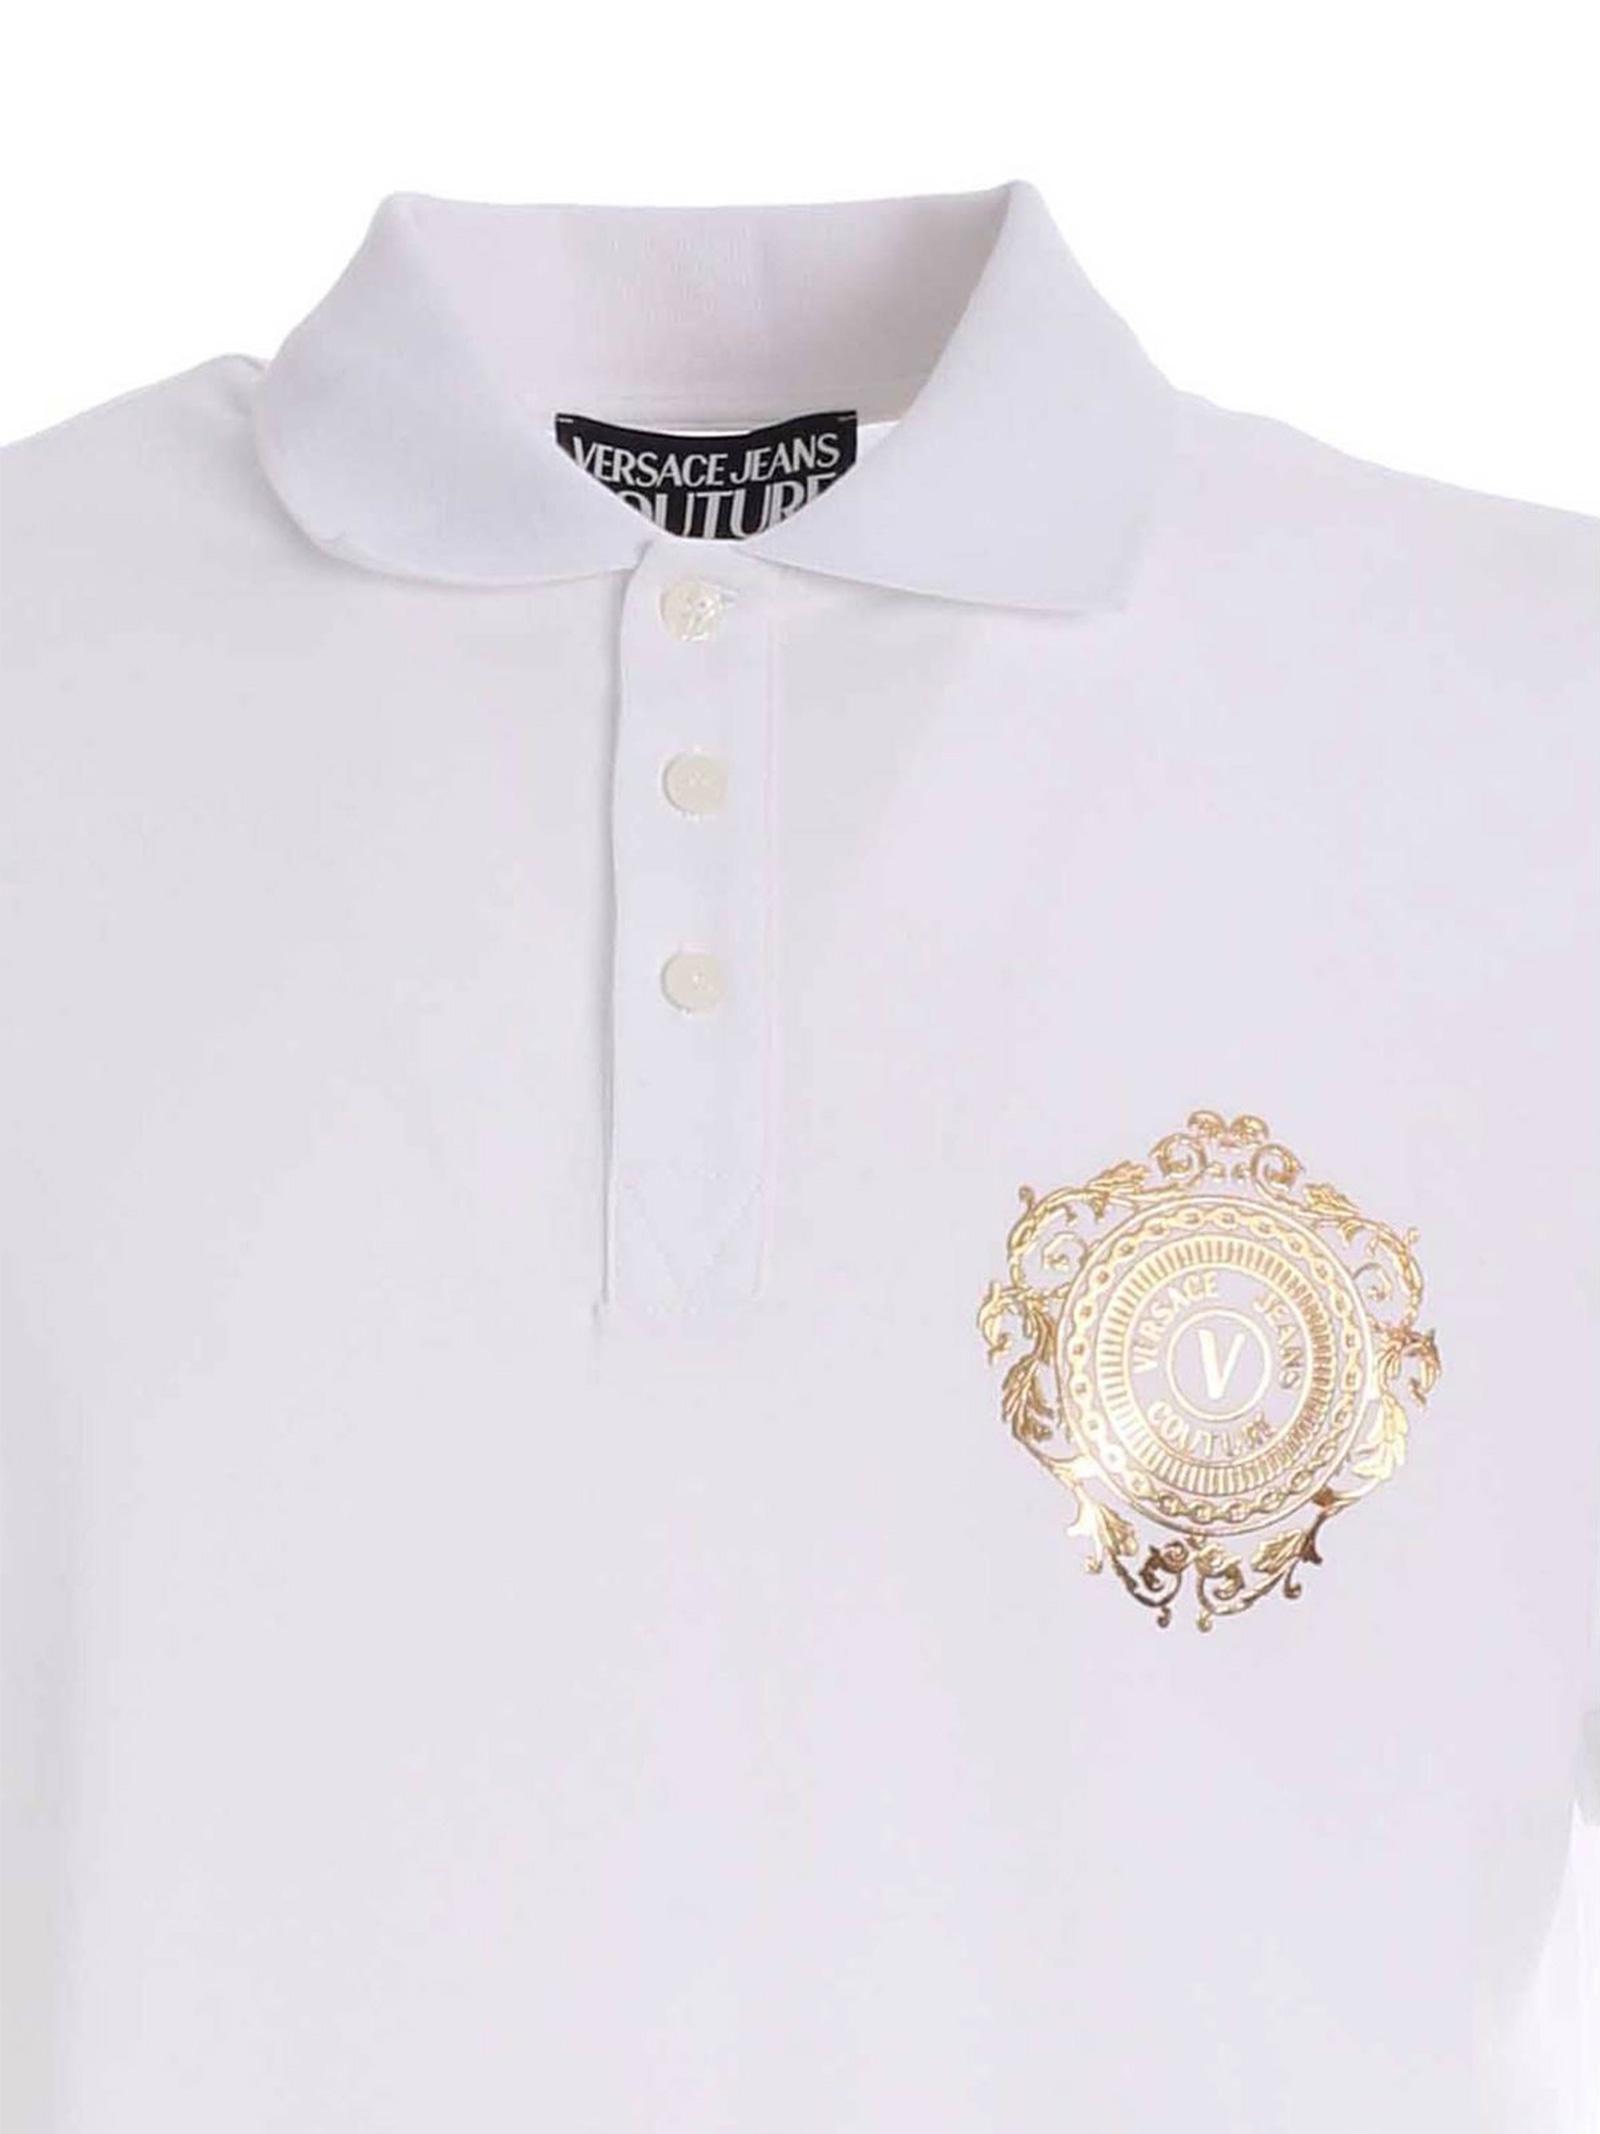 T-shirt Maniche Corte VERSACE JEANS | T-shirt | B3 GWA75F30455 K41